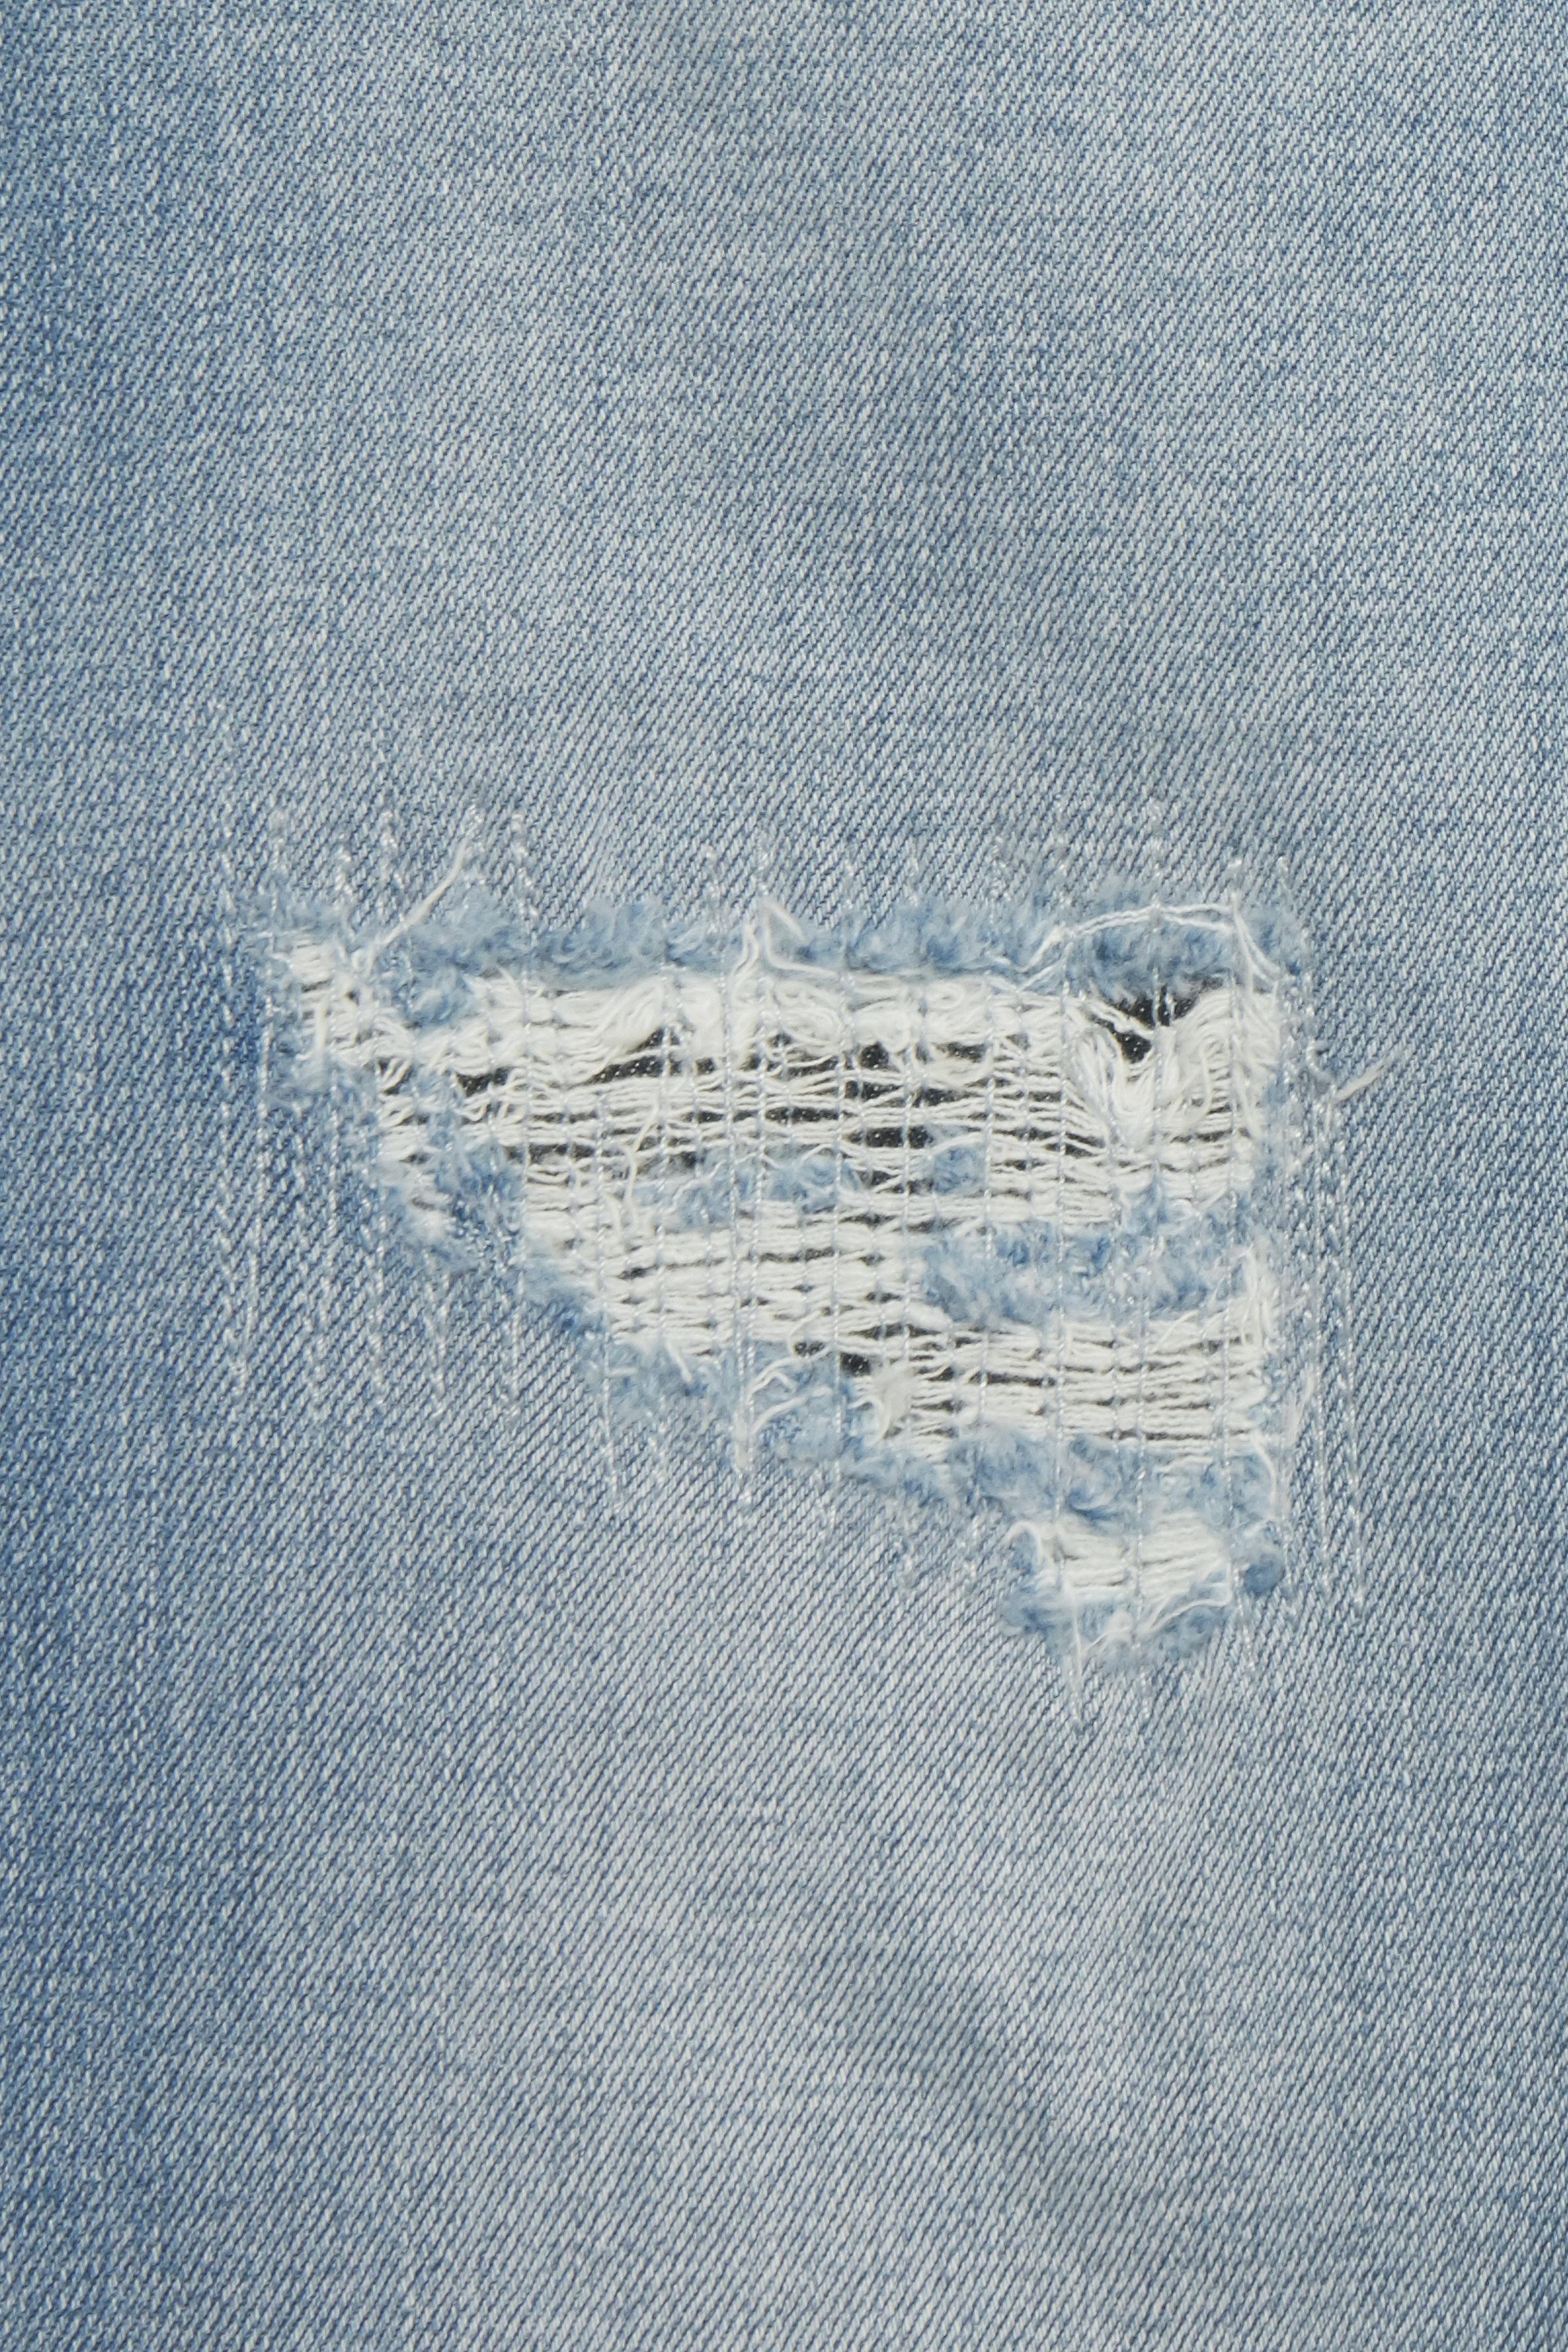 Lys denimblå Ankel-denimbuks fra b.young – Køb Lys denimblå Ankel-denimbuks fra str. 25-36 her